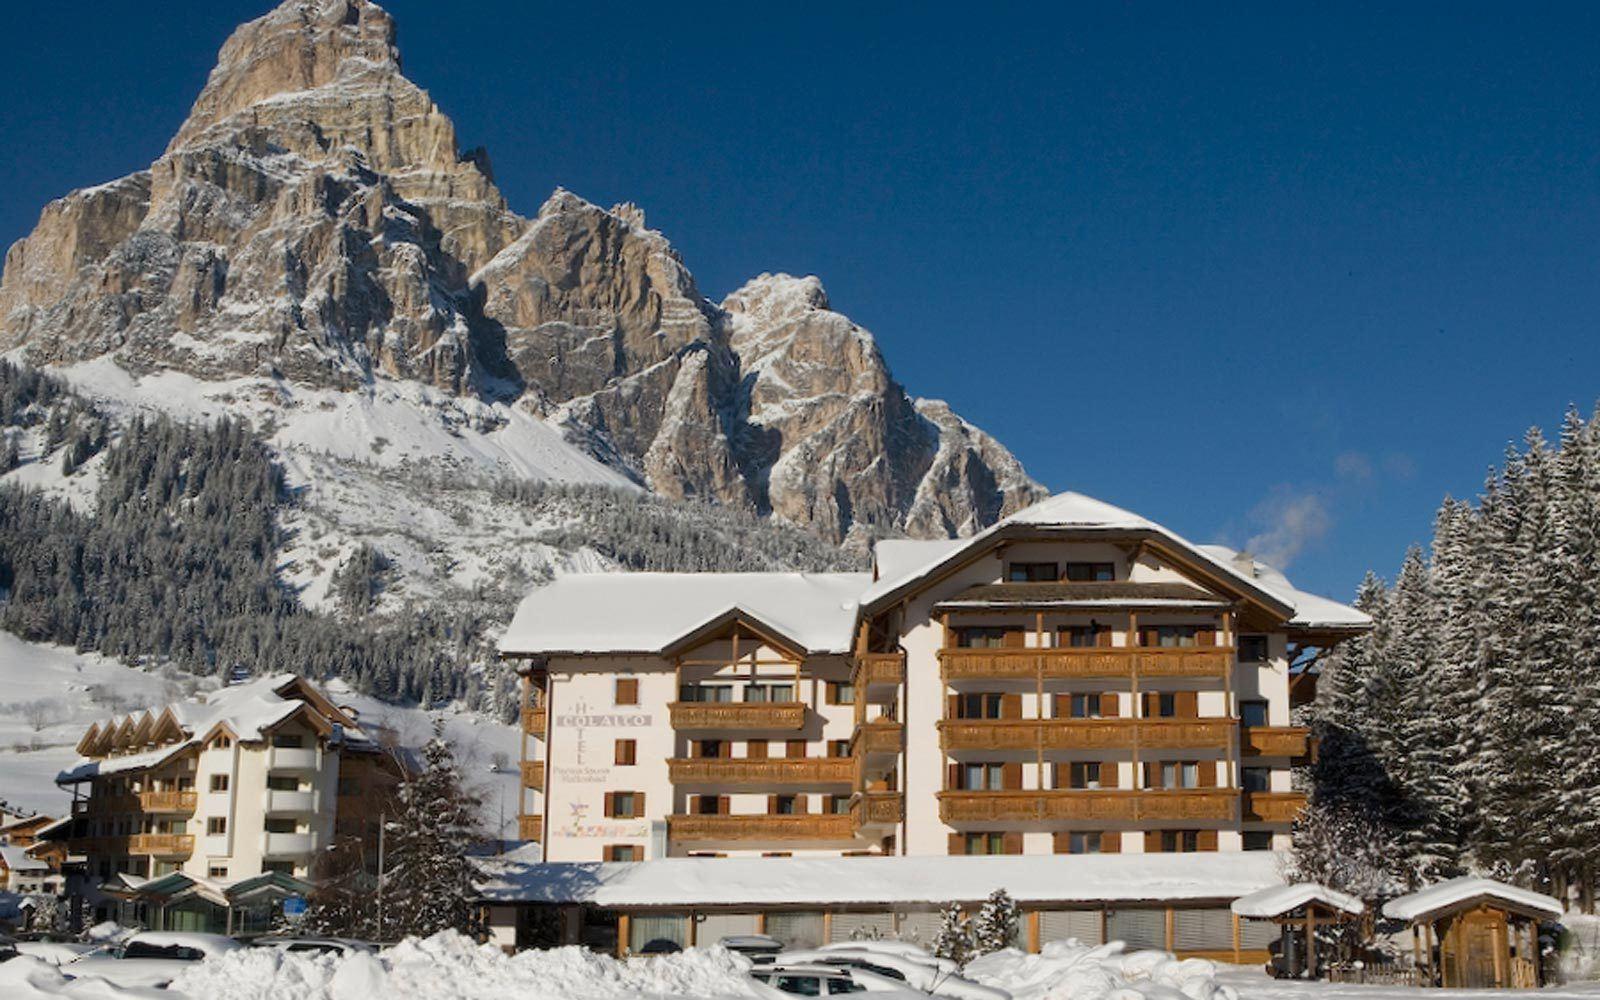 Hotel Col Alto - Val gardena